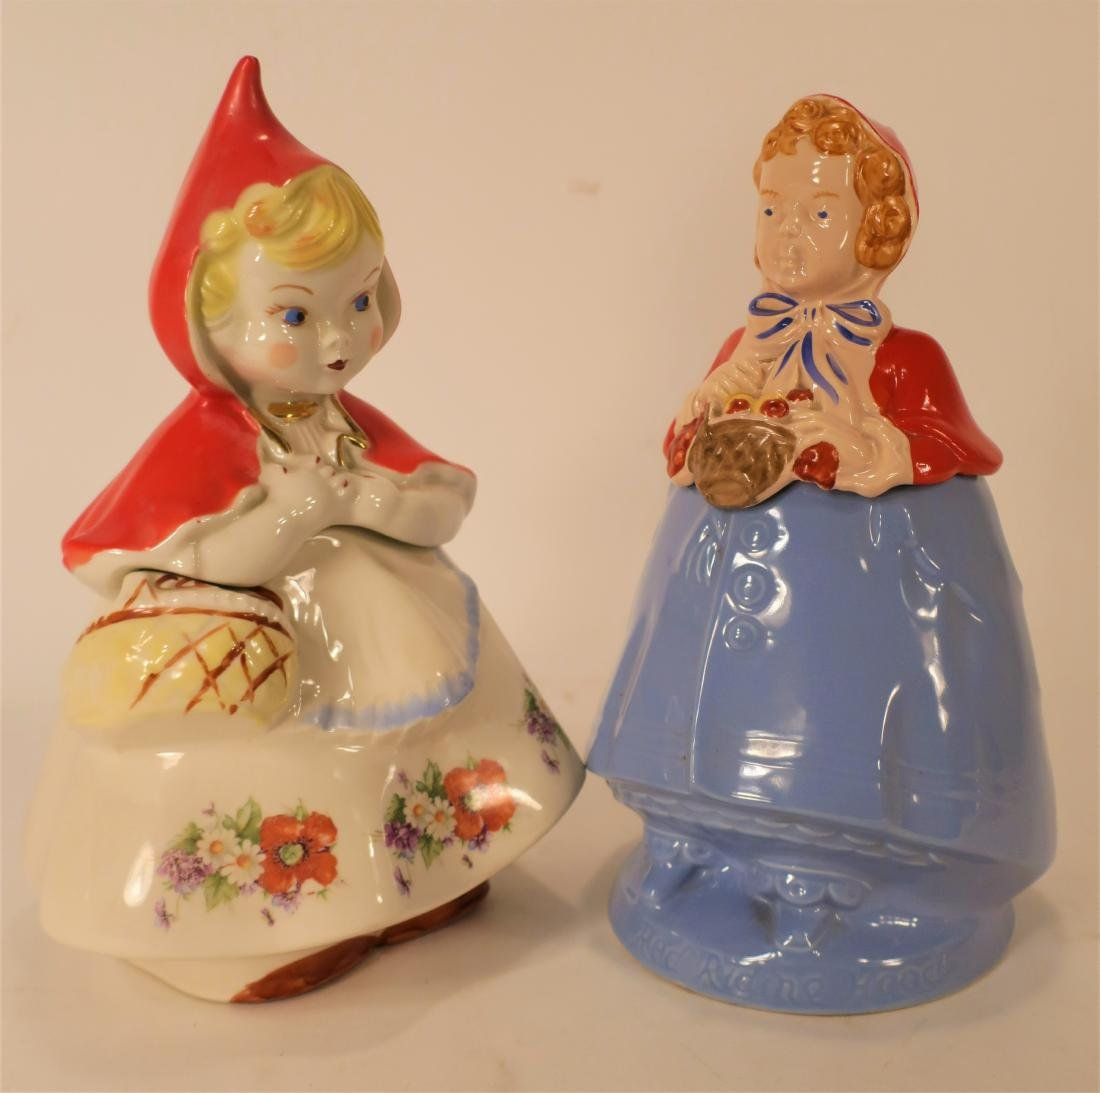 Little Red Riding Hood Three Ceramic Cookie Jars - 5